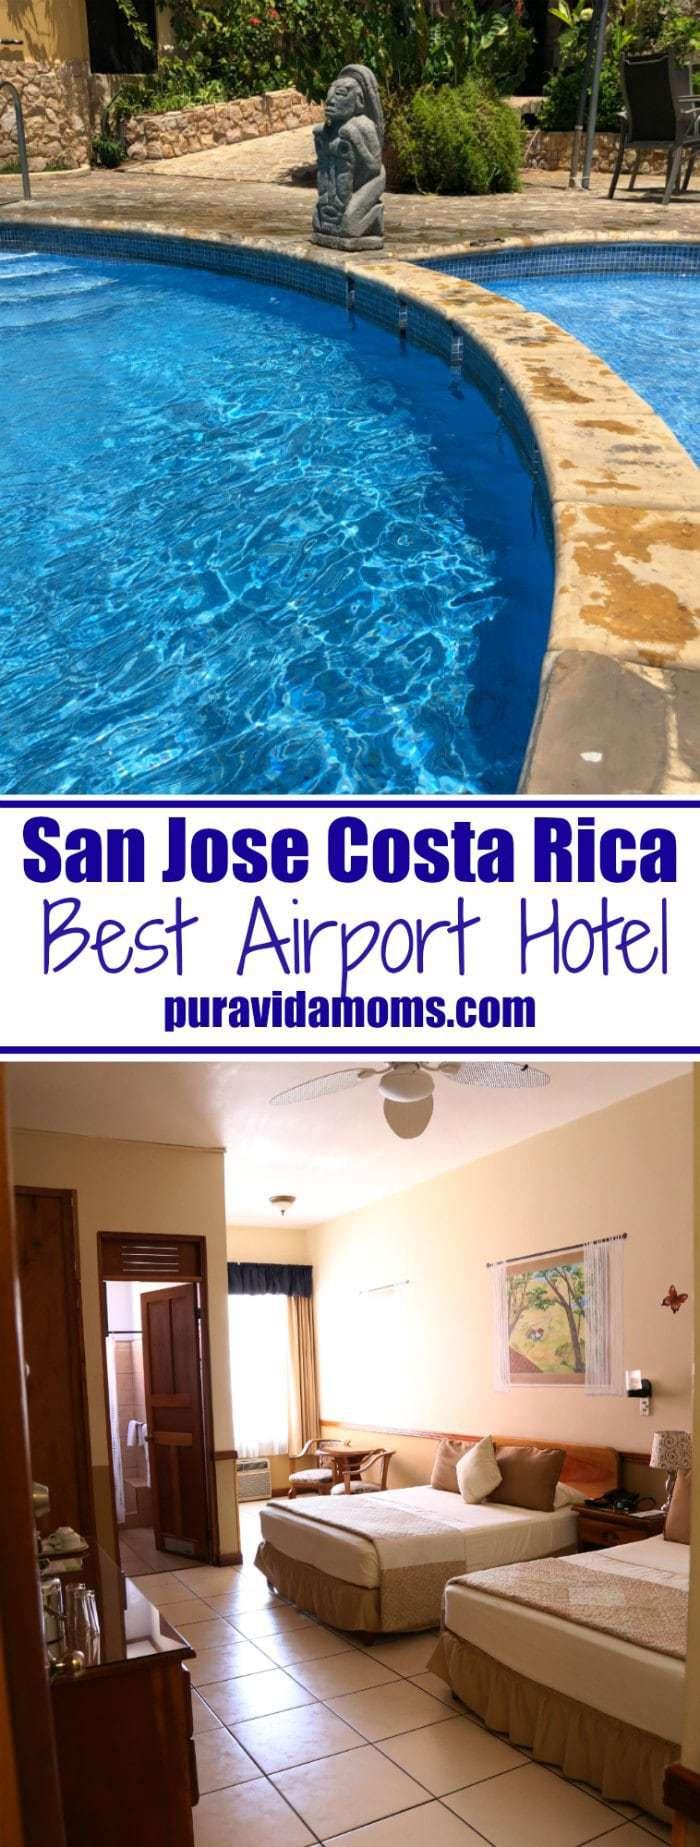 Best Airport Hotel San Jose Costa Rica